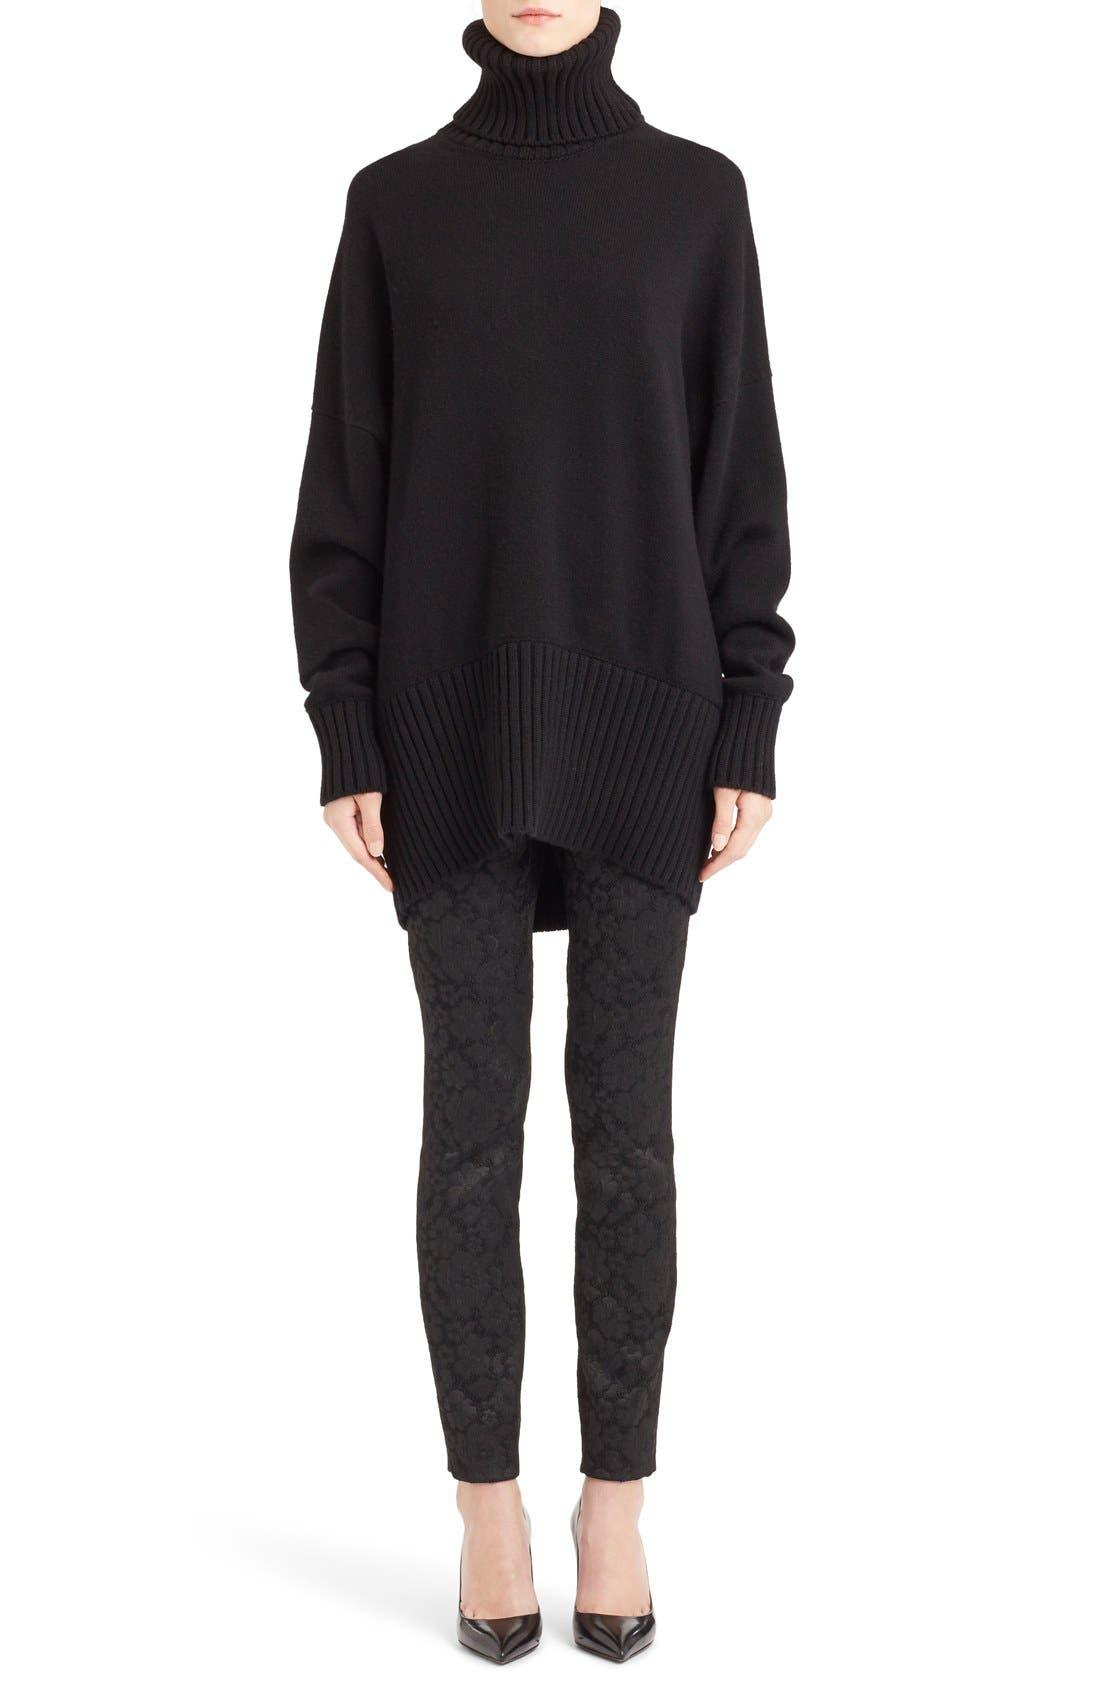 Main Image - Dolce&Gabbana Turtleneck Cashmere Sweater